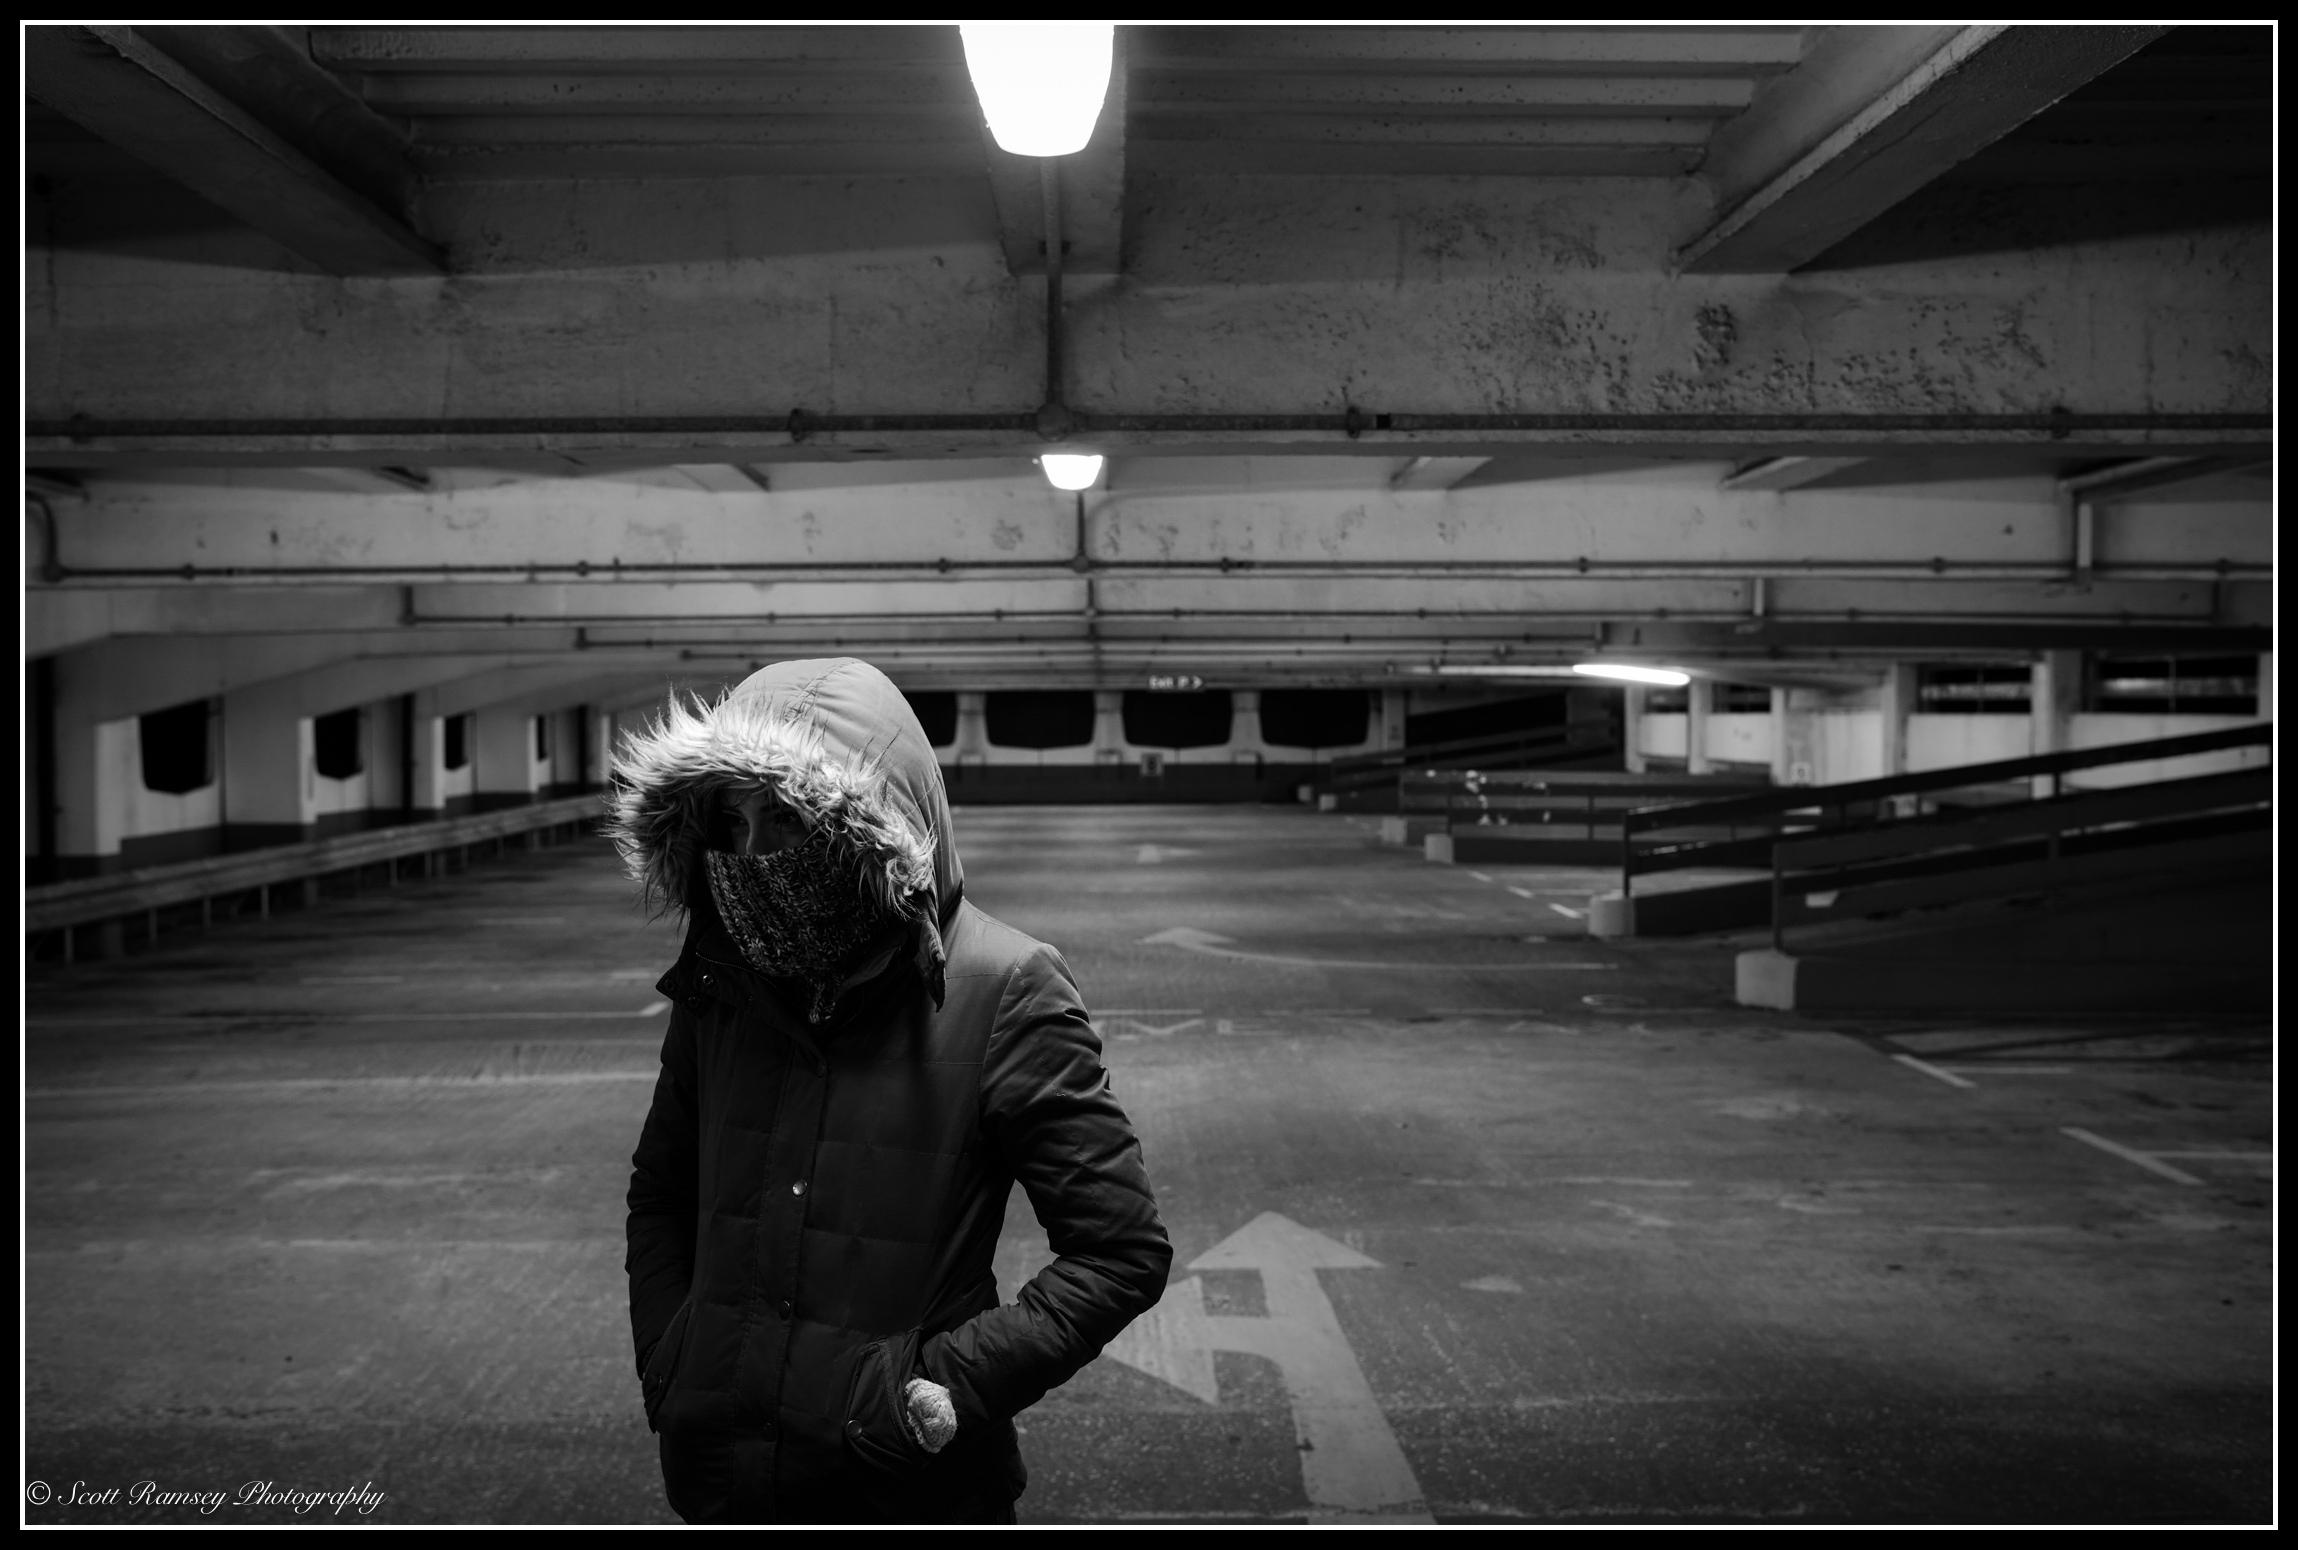 Urban-Nights-Car-Park-Lights-ScottRamseyPhotography-020215-053BWB